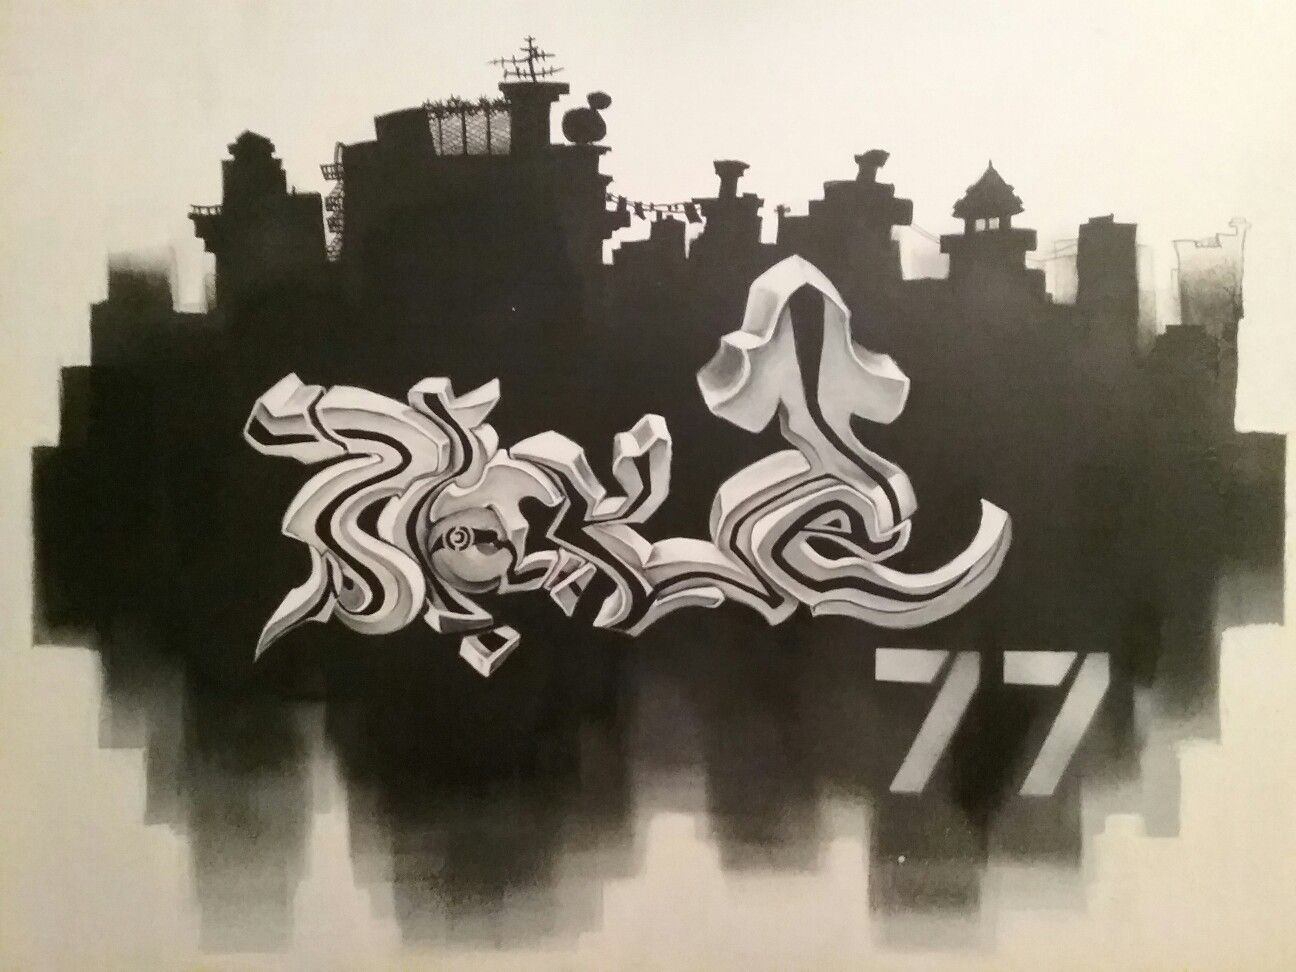 Blake In 3d Graffiti Letters Artwork 3 Graffiti Lettering